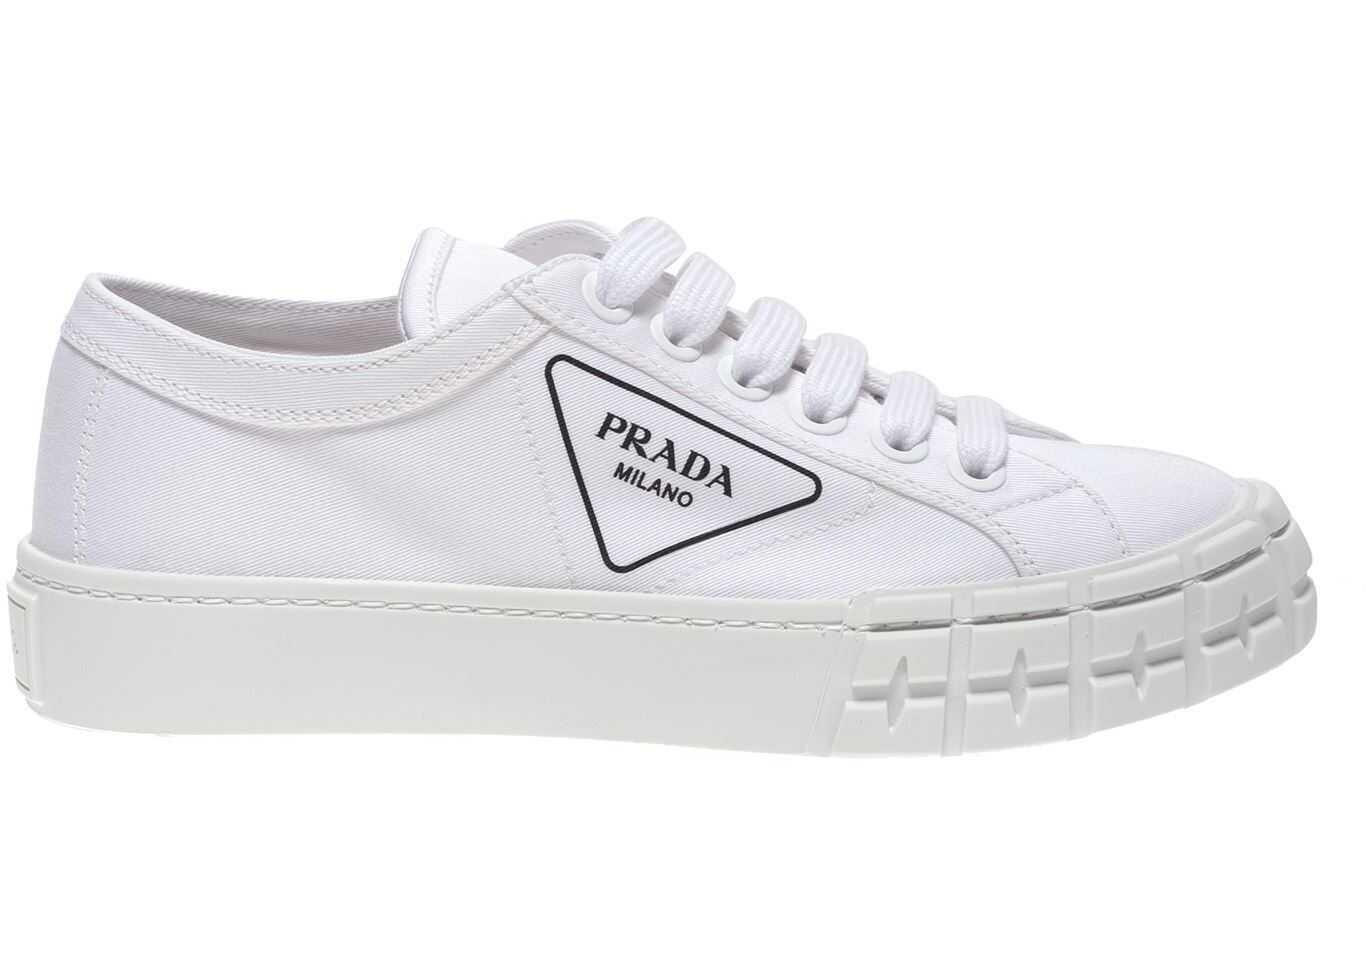 Prada Branded Gabardine Sneakers In White White